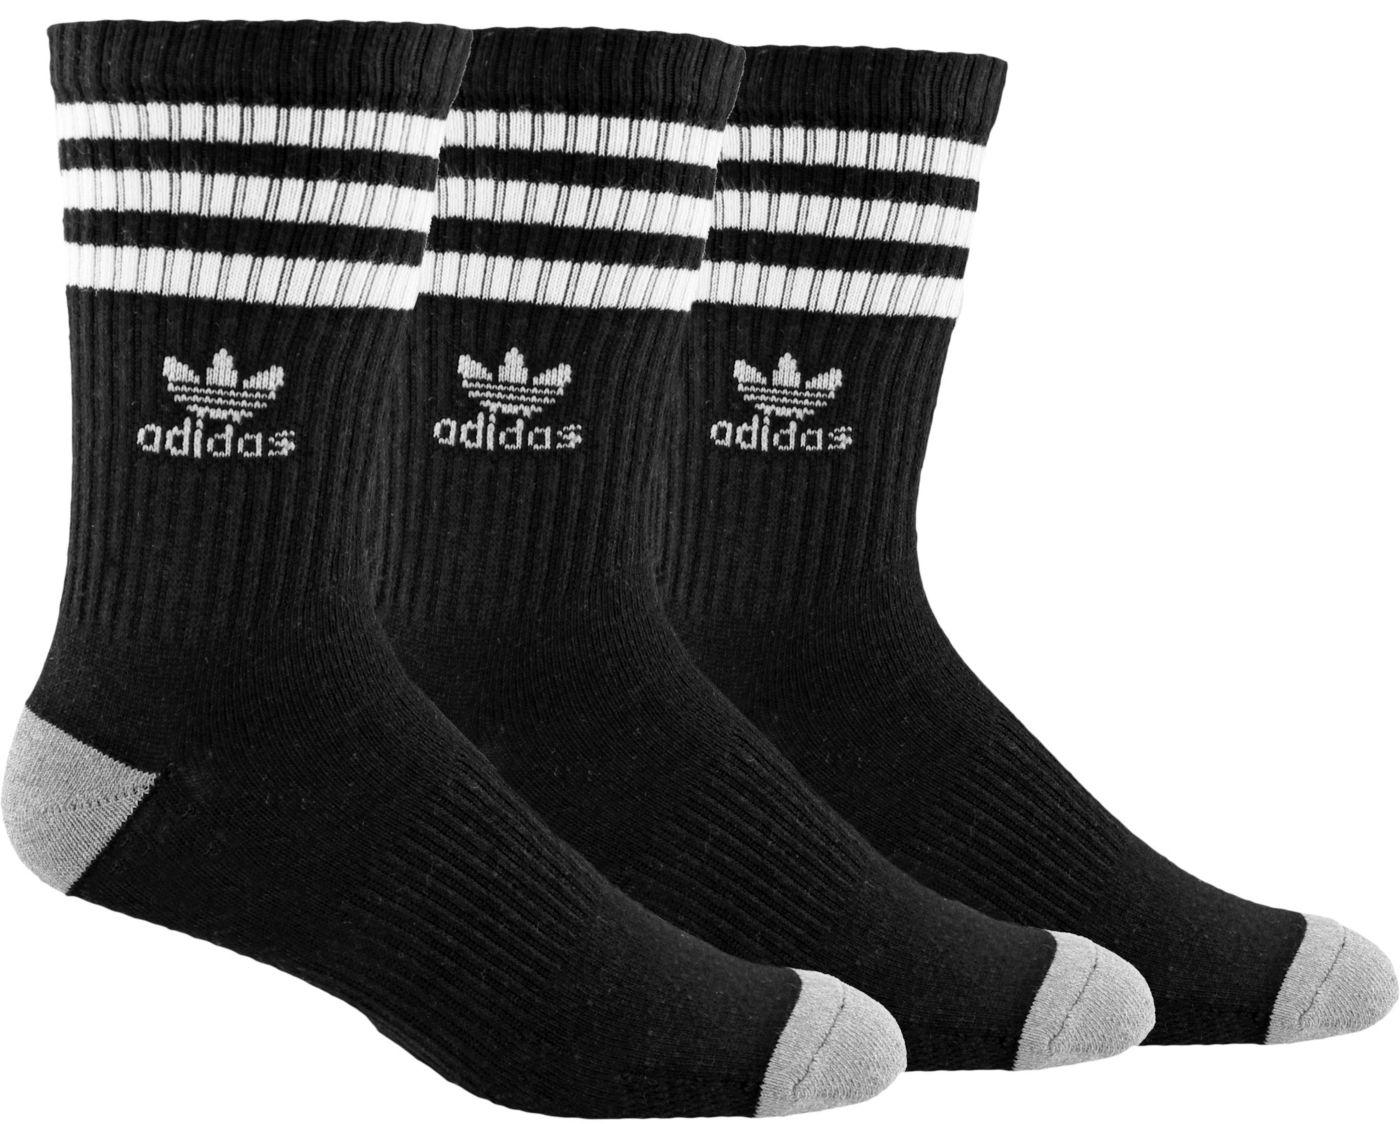 adidas Men's Originals Roller Crew Socks 3-Pack